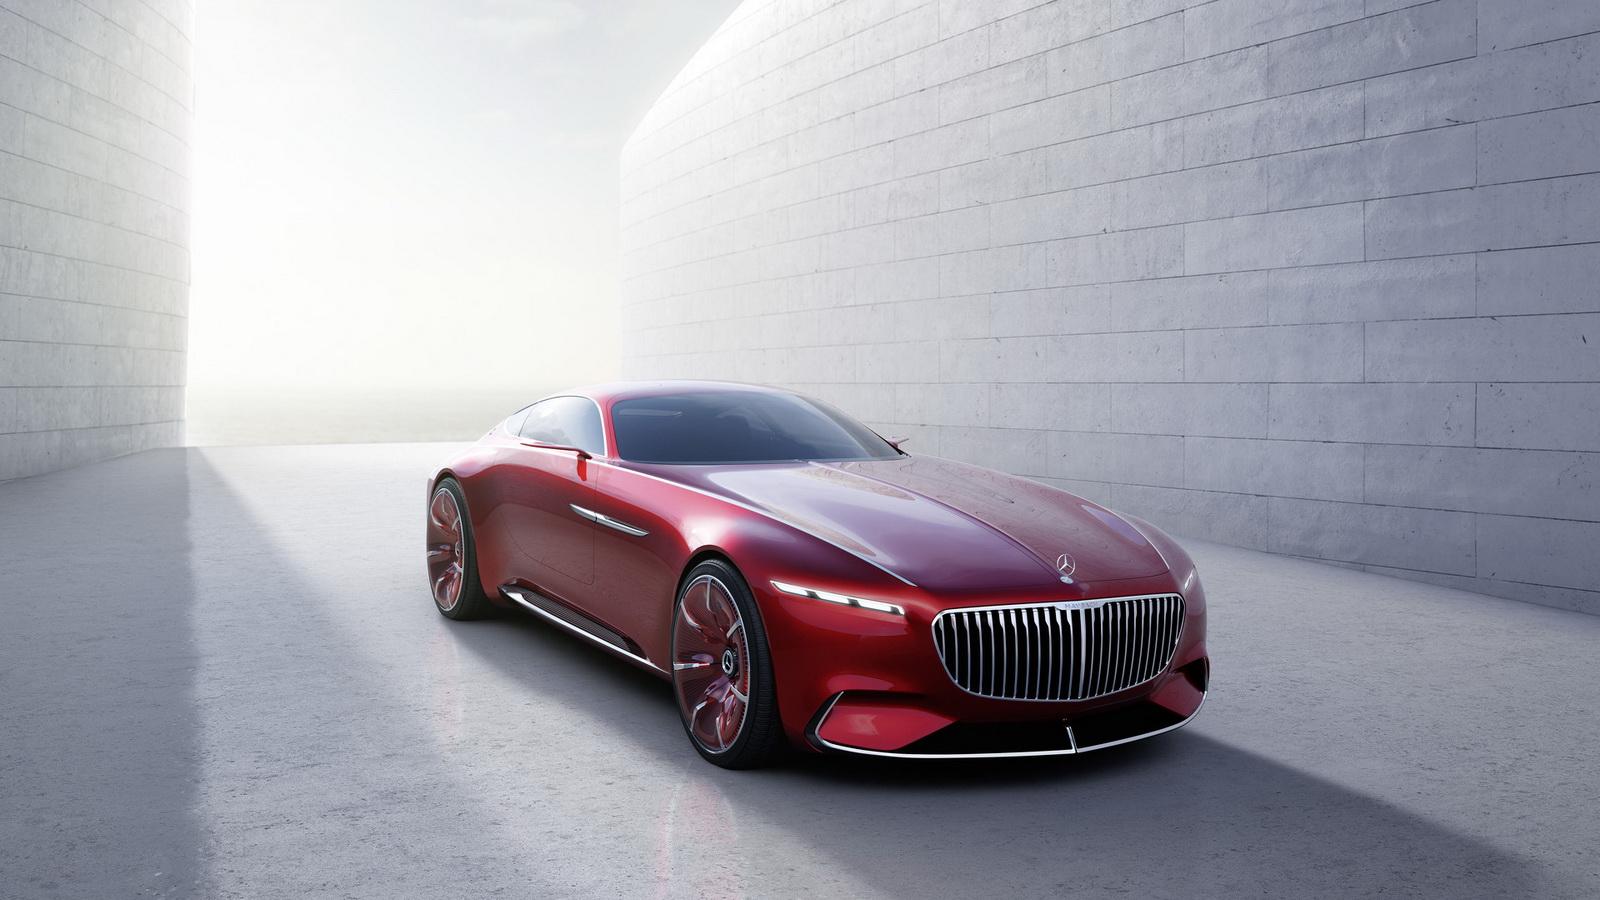 Концепт Vision Mercedes-Maybach 6 получил «крылья чайки»